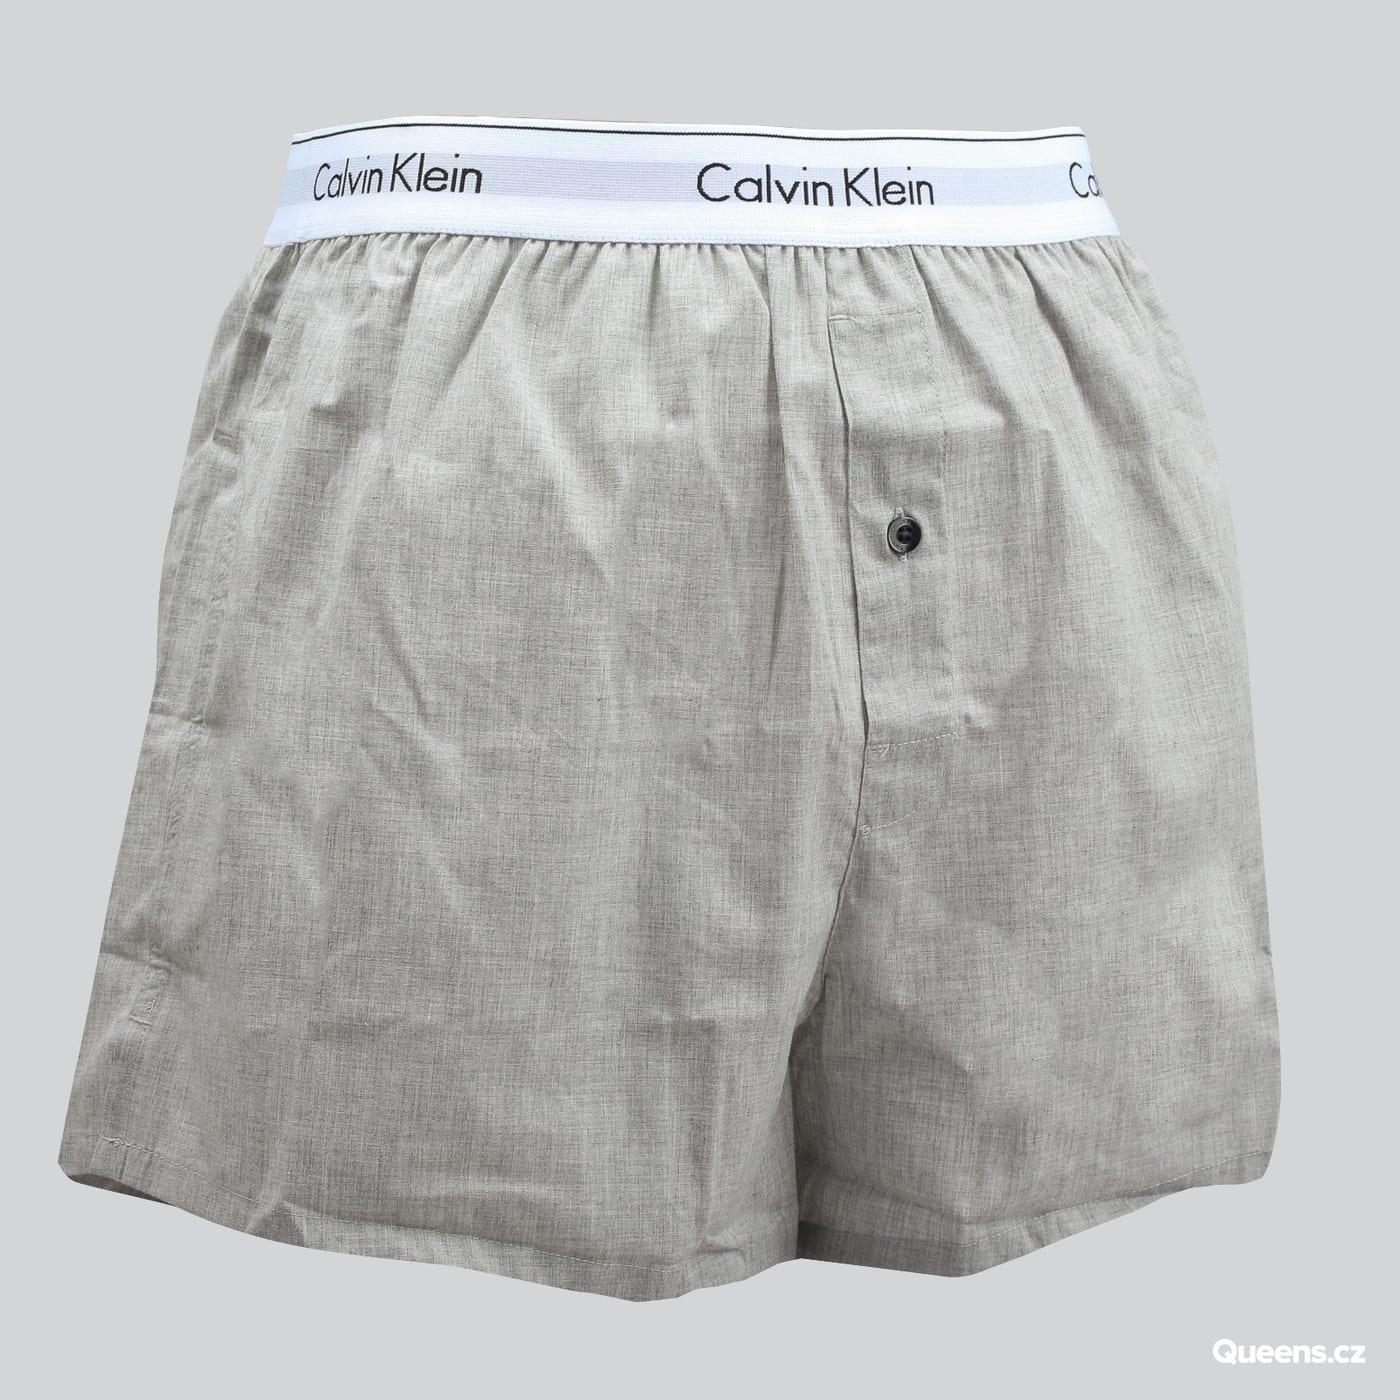 Calvin Klein 2 Pack Slim Fit Boxers C/O schwarz / melange grau